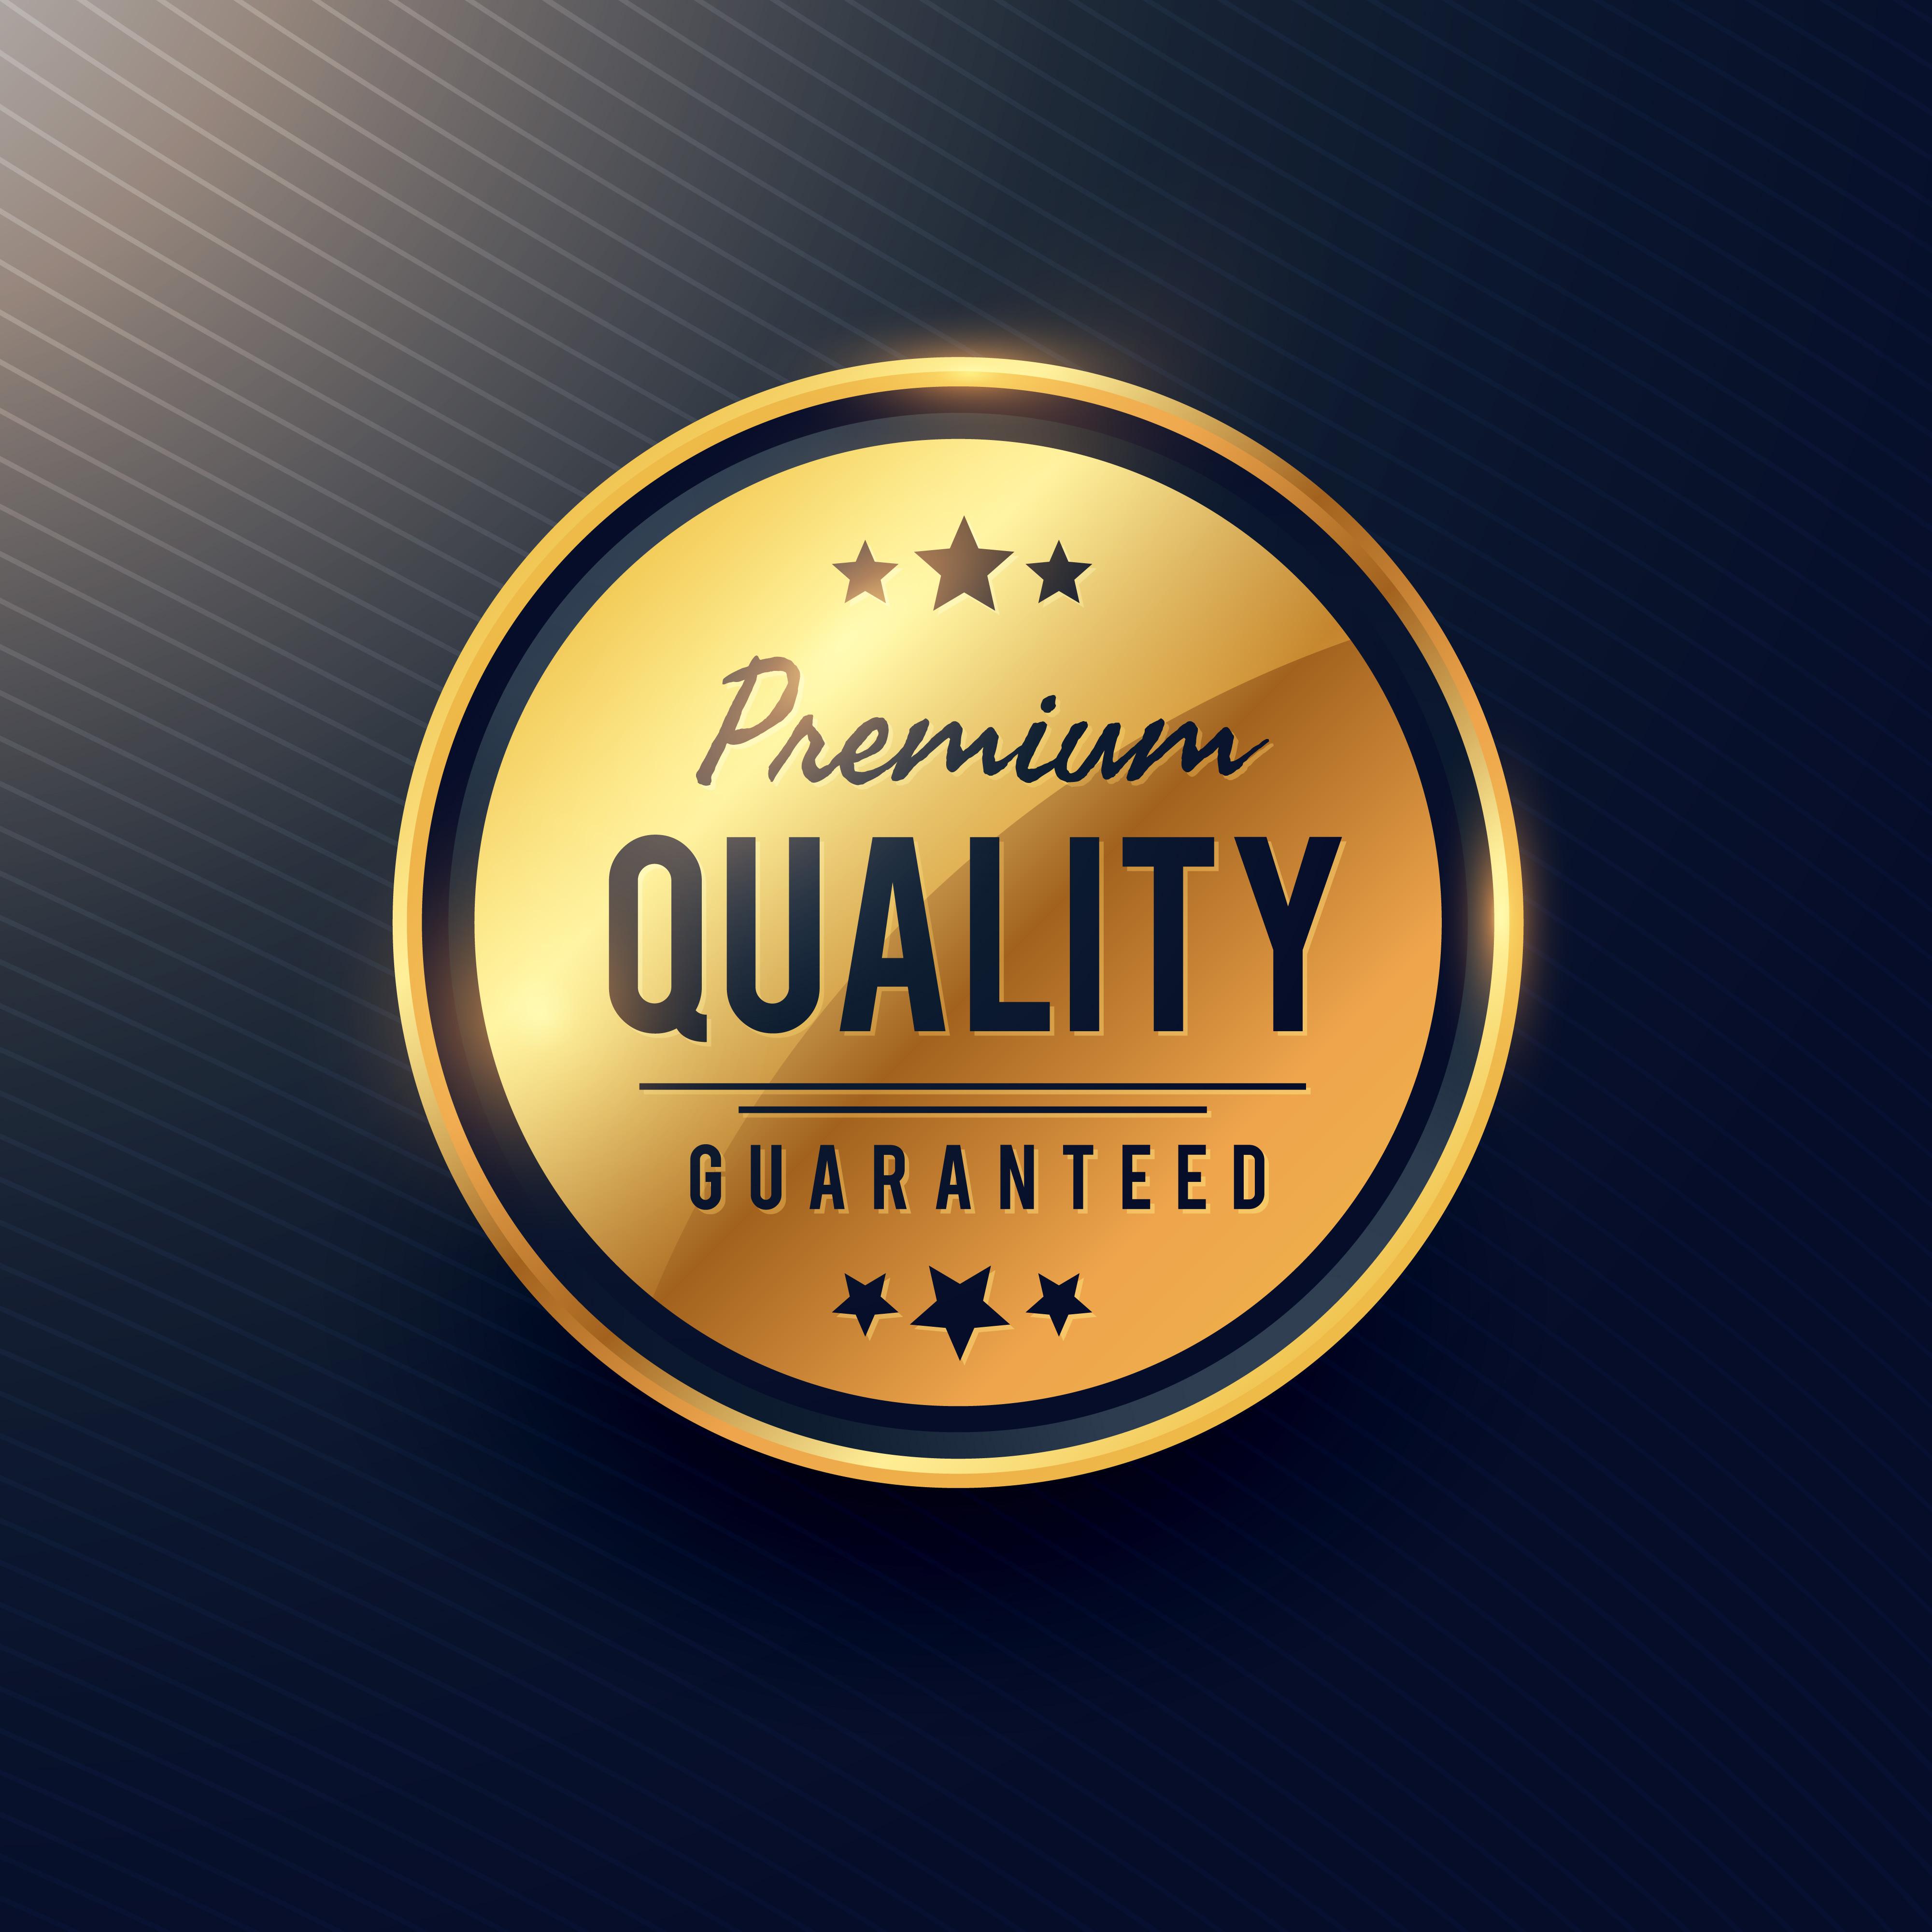 Premium Quality Label And Badge Design In Golden Color